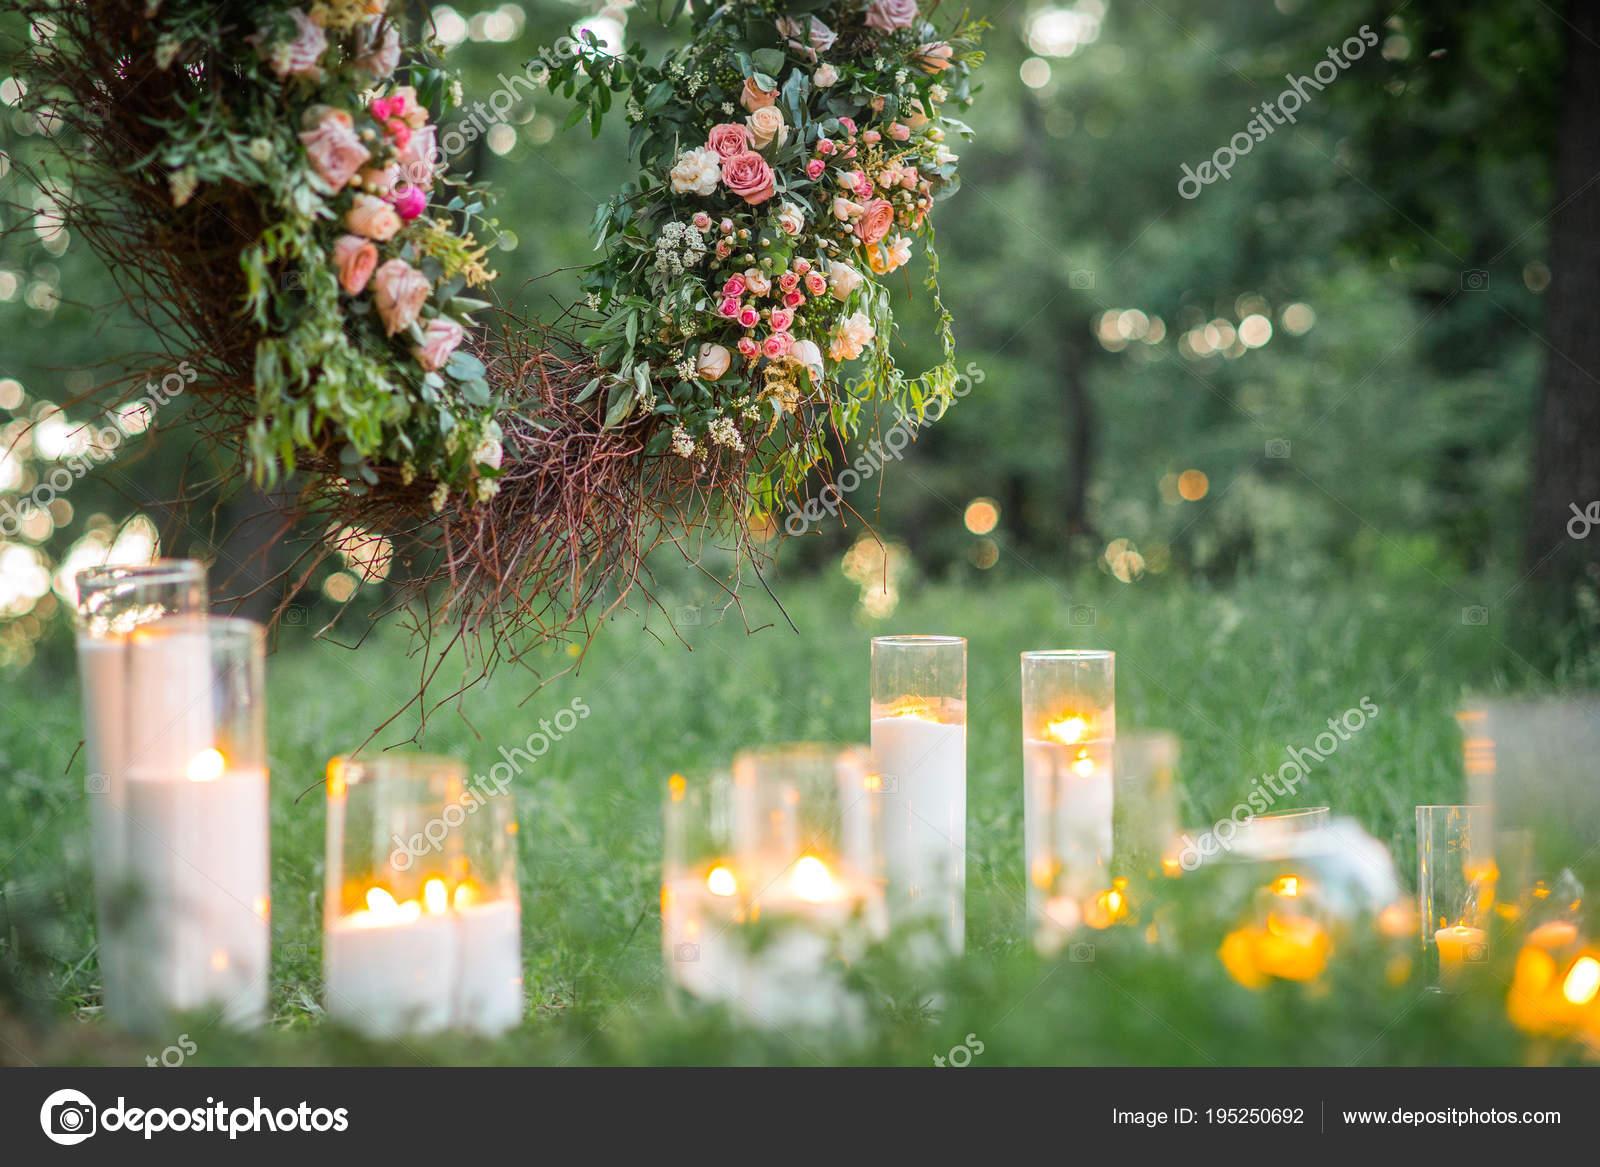 Detailni Foto Krasne Svatebni Dekorace Kvetinami Svickami Zelene